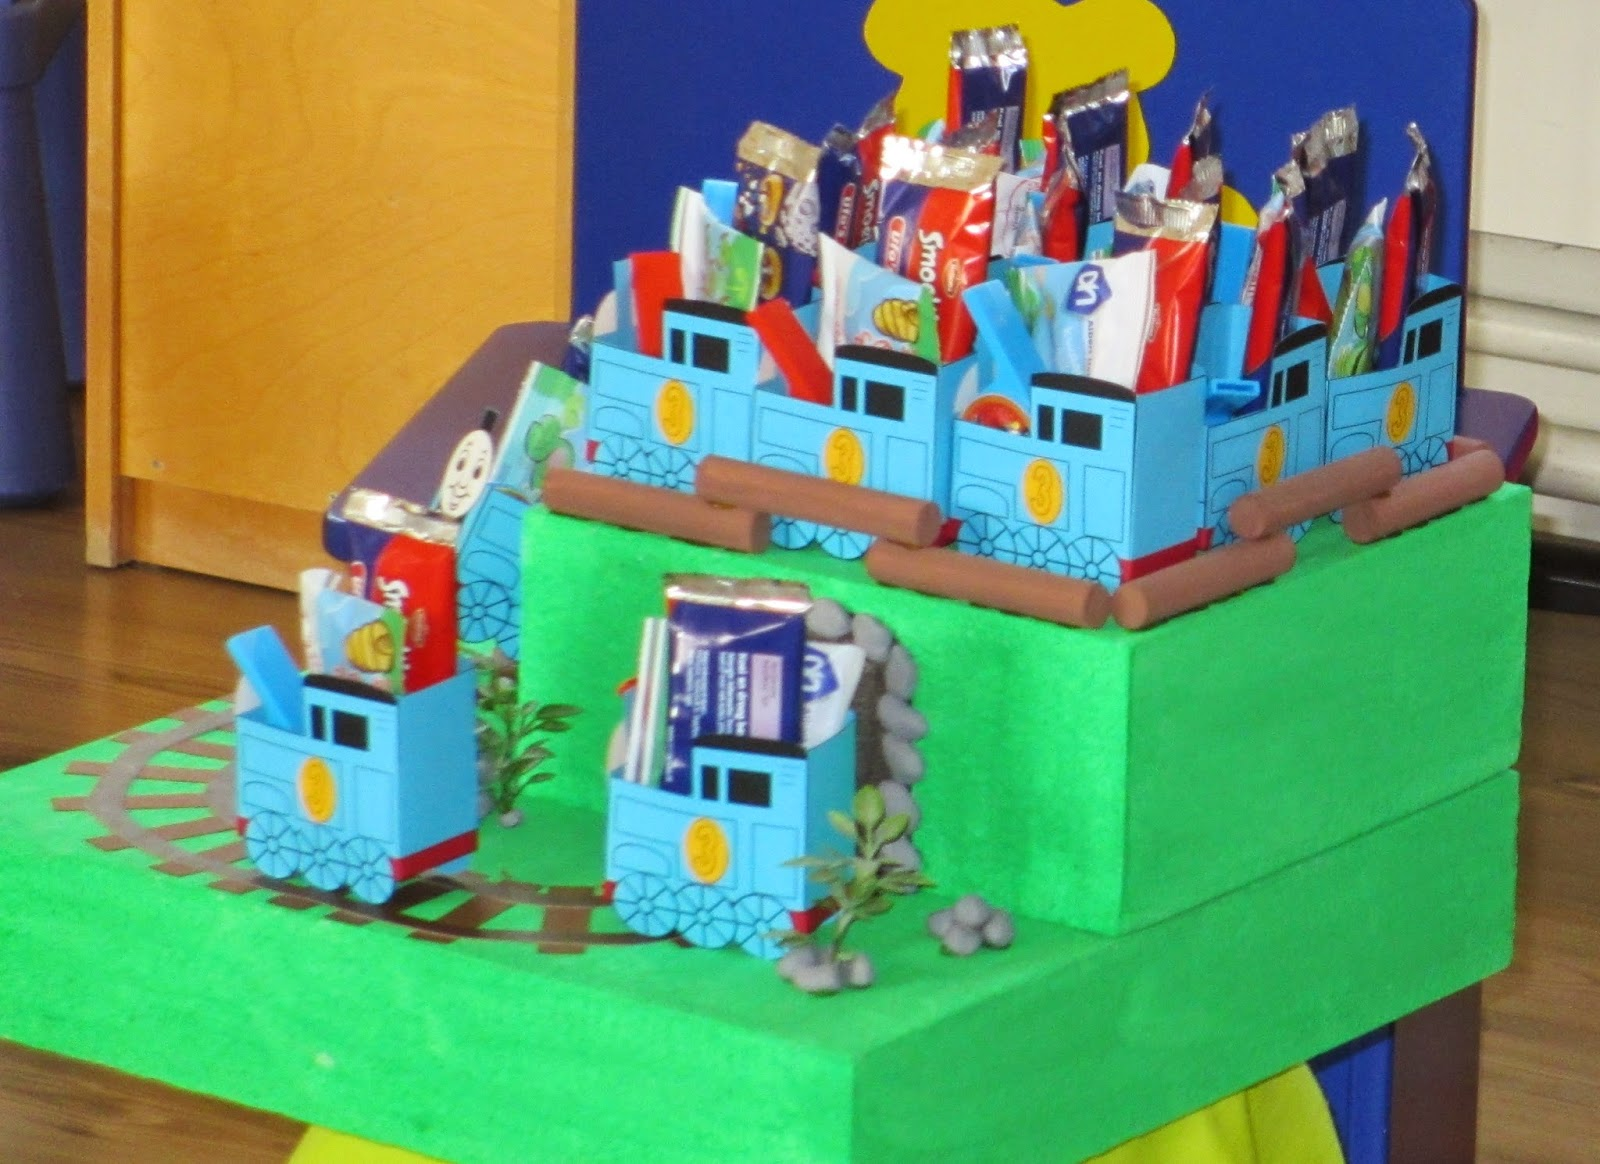 Thomas de trein traktatie, trein traktatie, traktatie zelf knutselen, traktatie plateau zelf maken